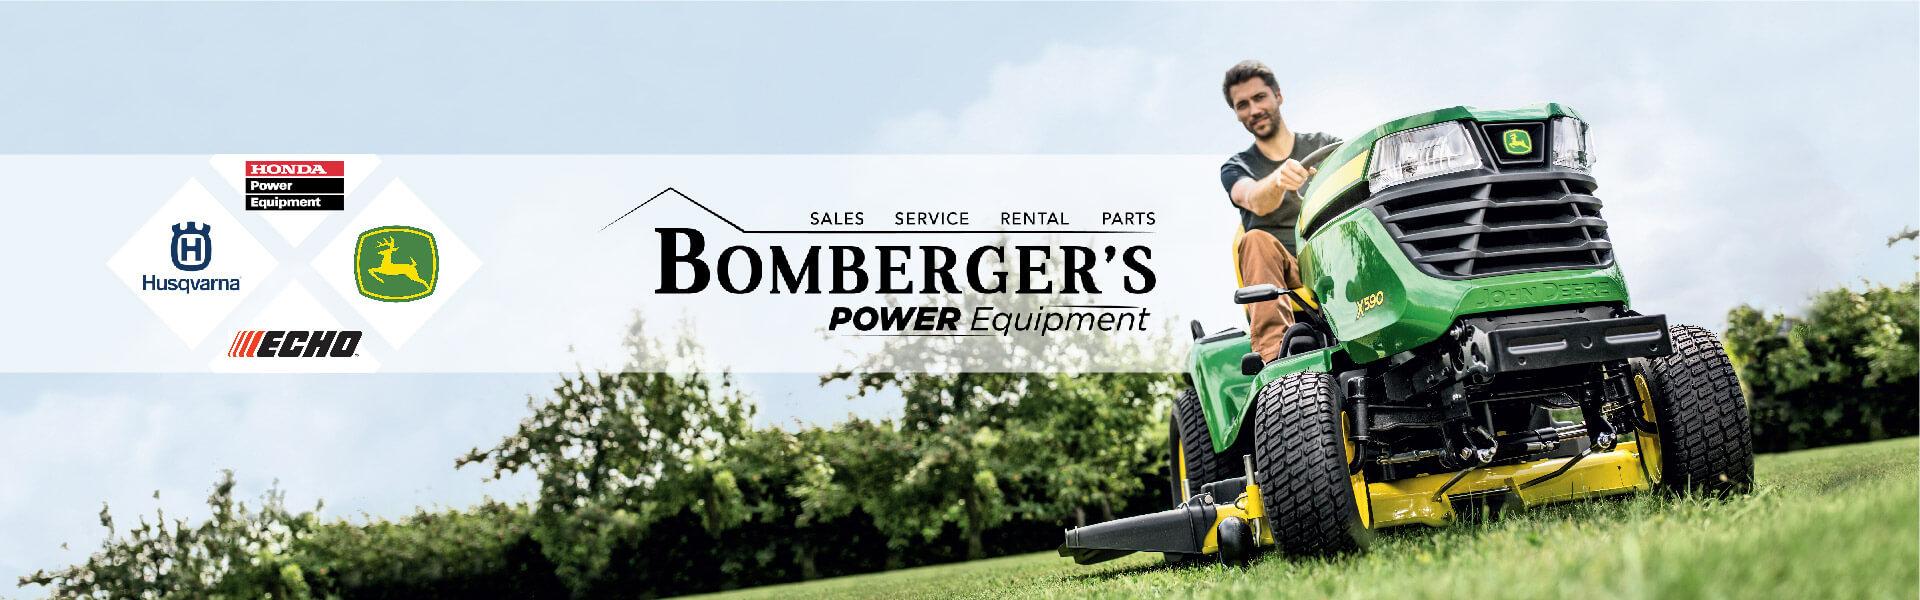 Bombergers slide1-01(1)